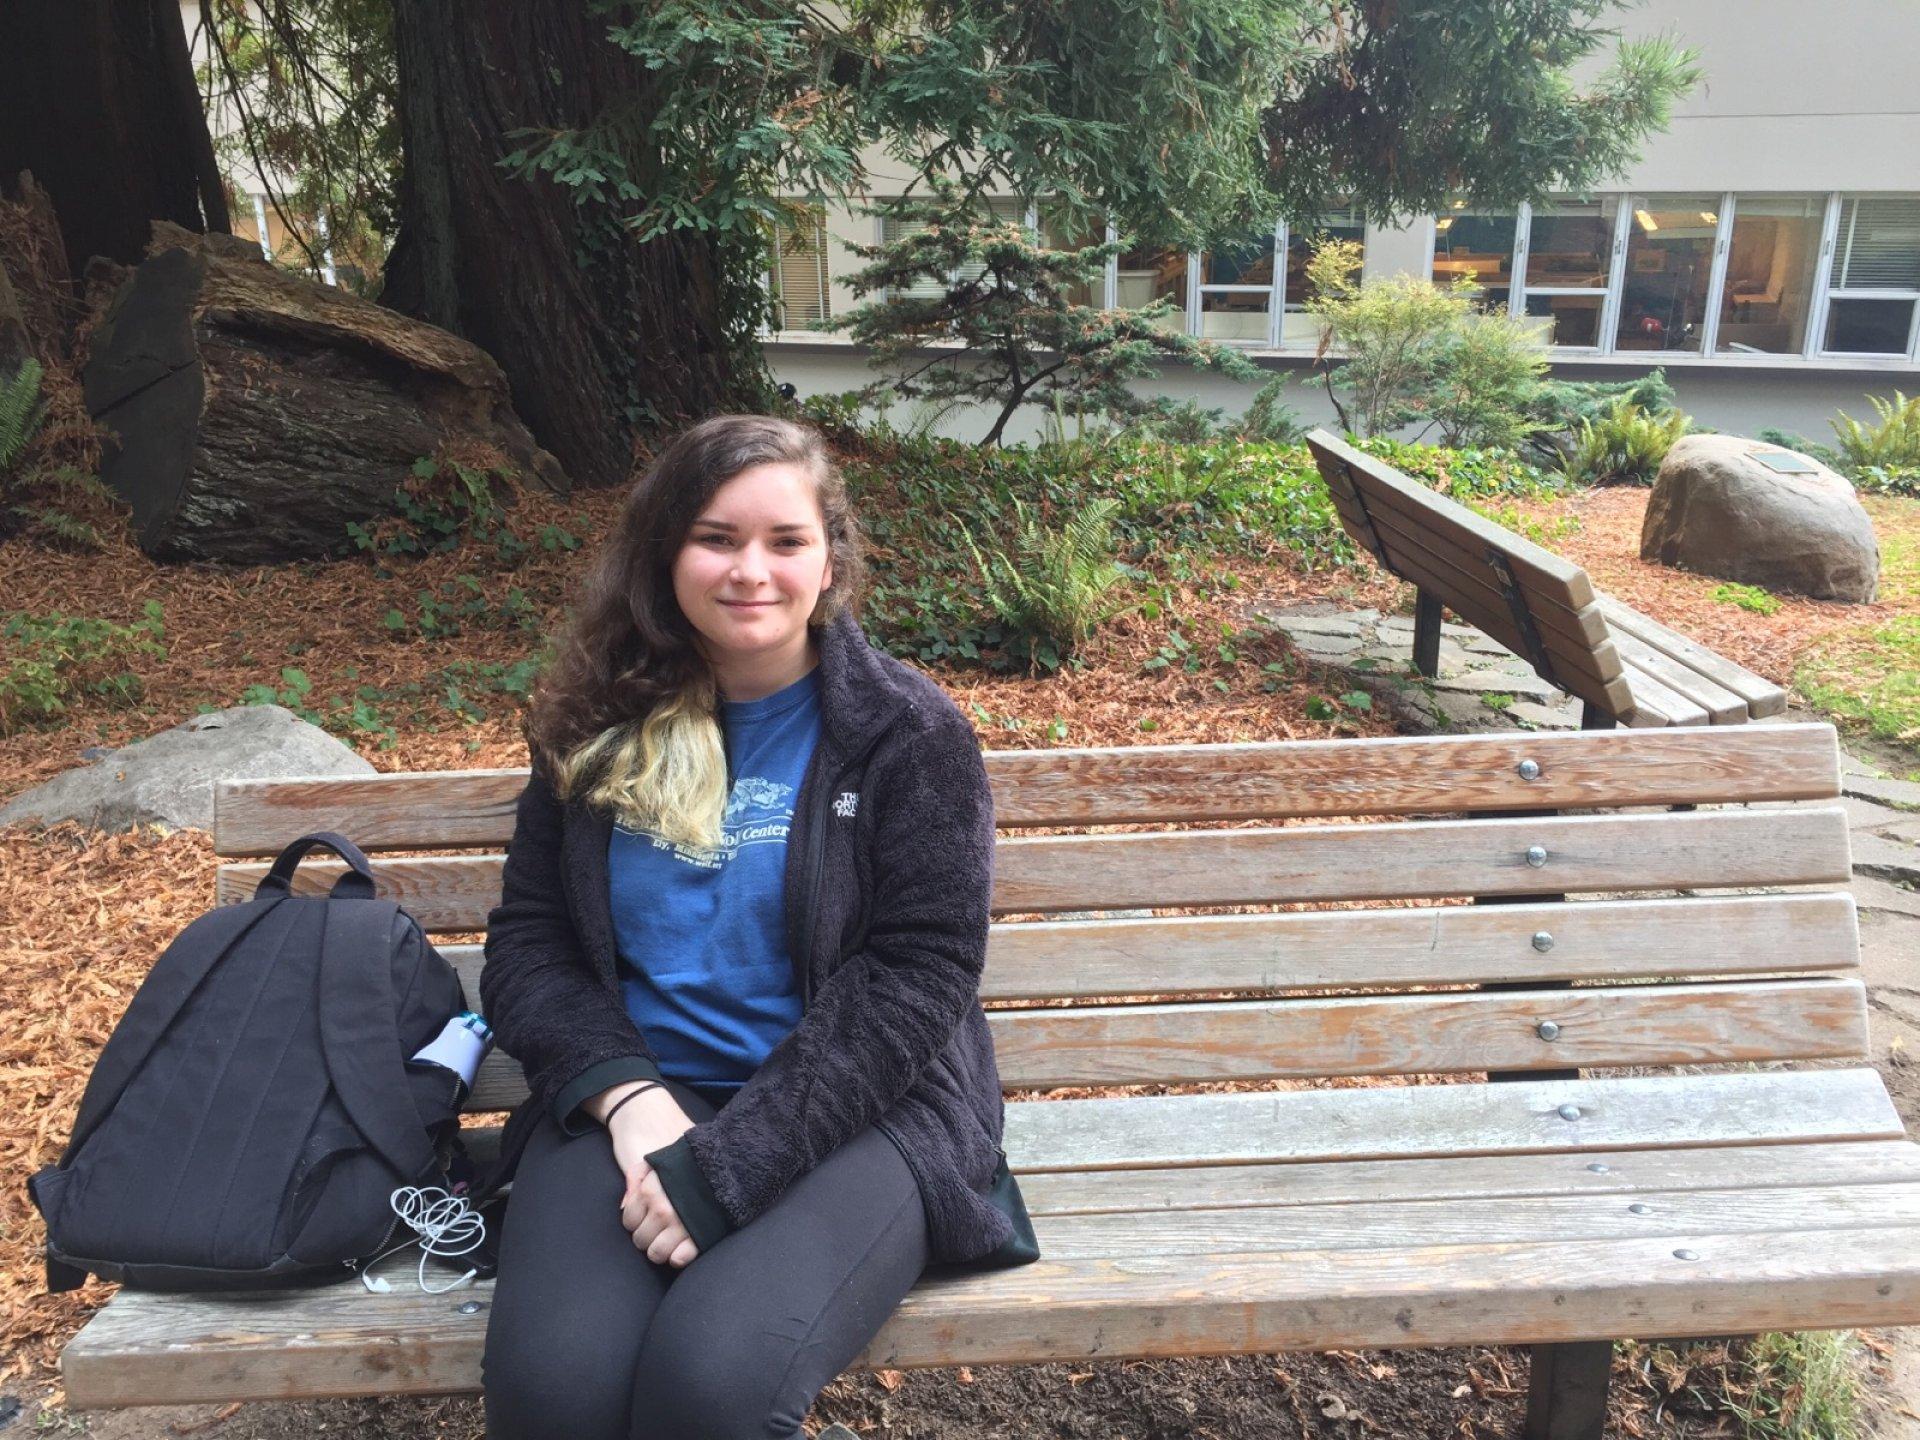 Ariel Robinson a mathematics major has found a community in Humboldt. Photo credit: Kyra Skylark